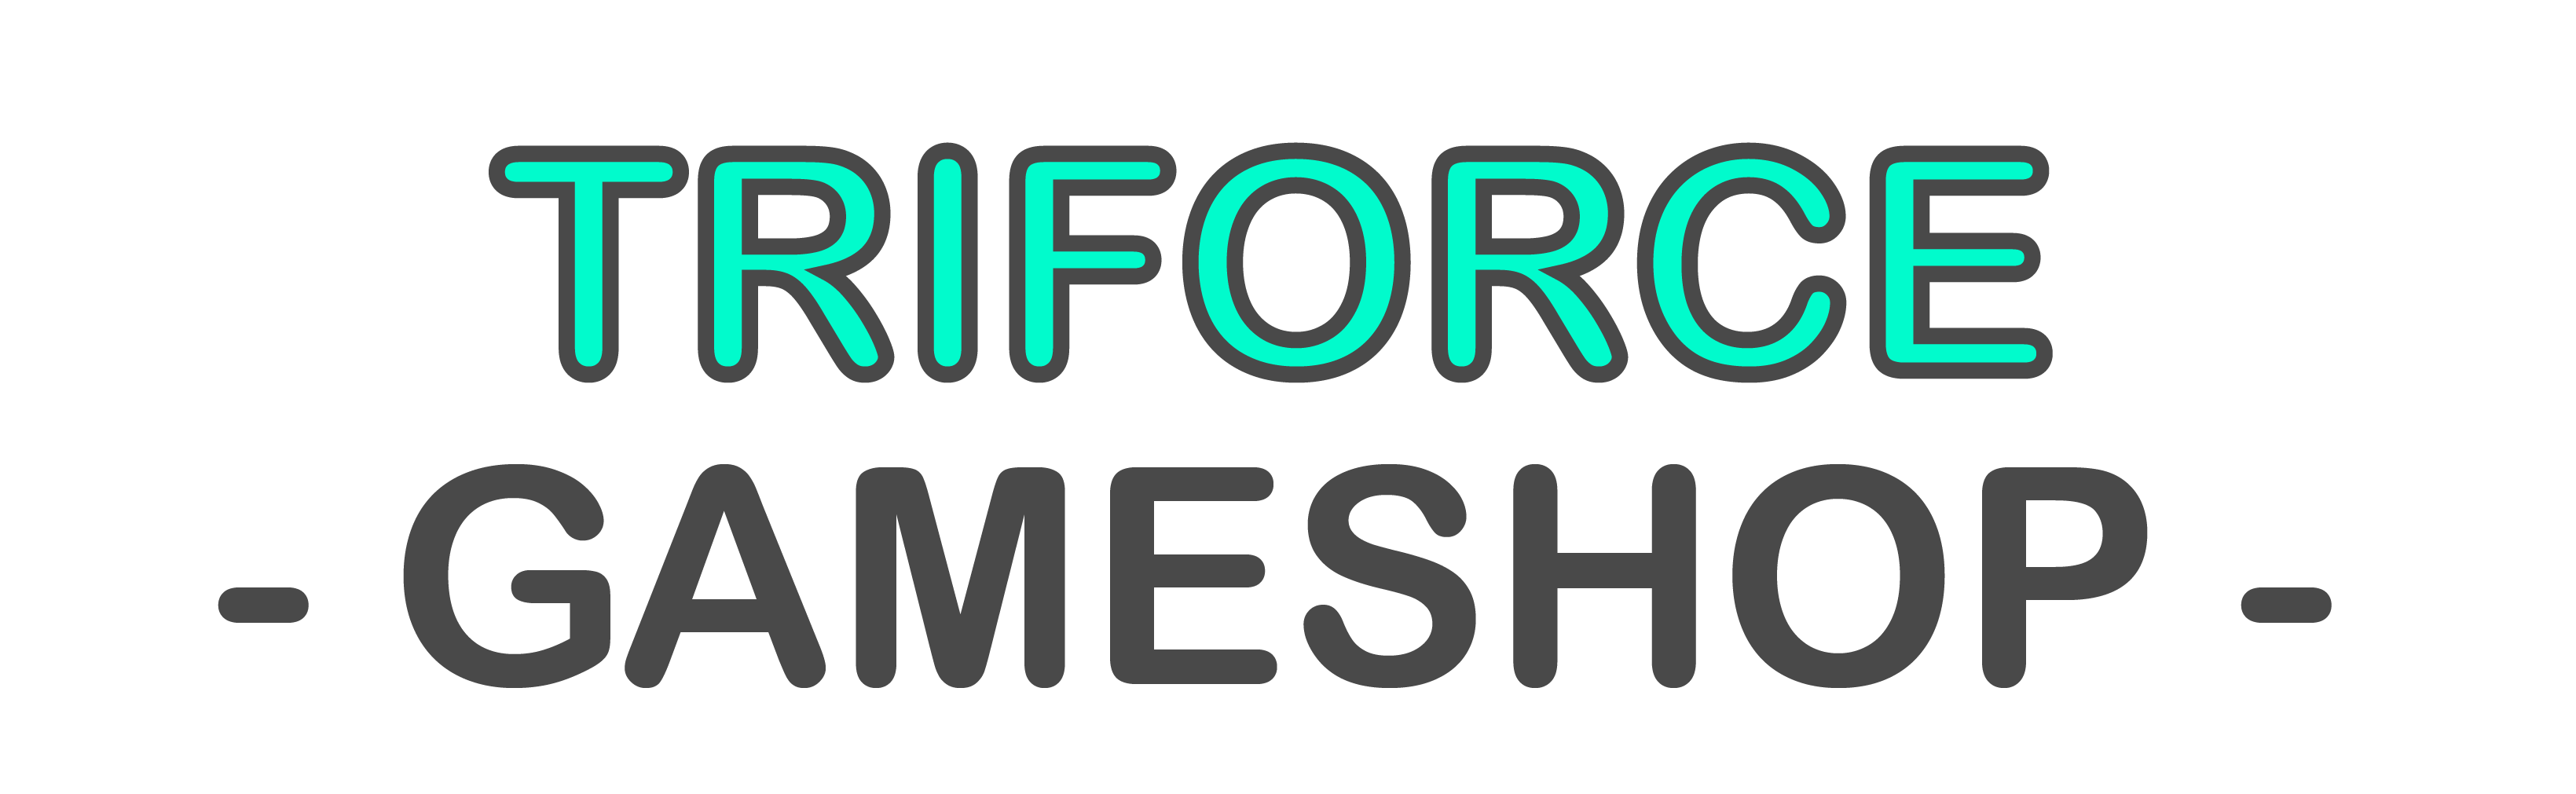 Triforce Game Shop